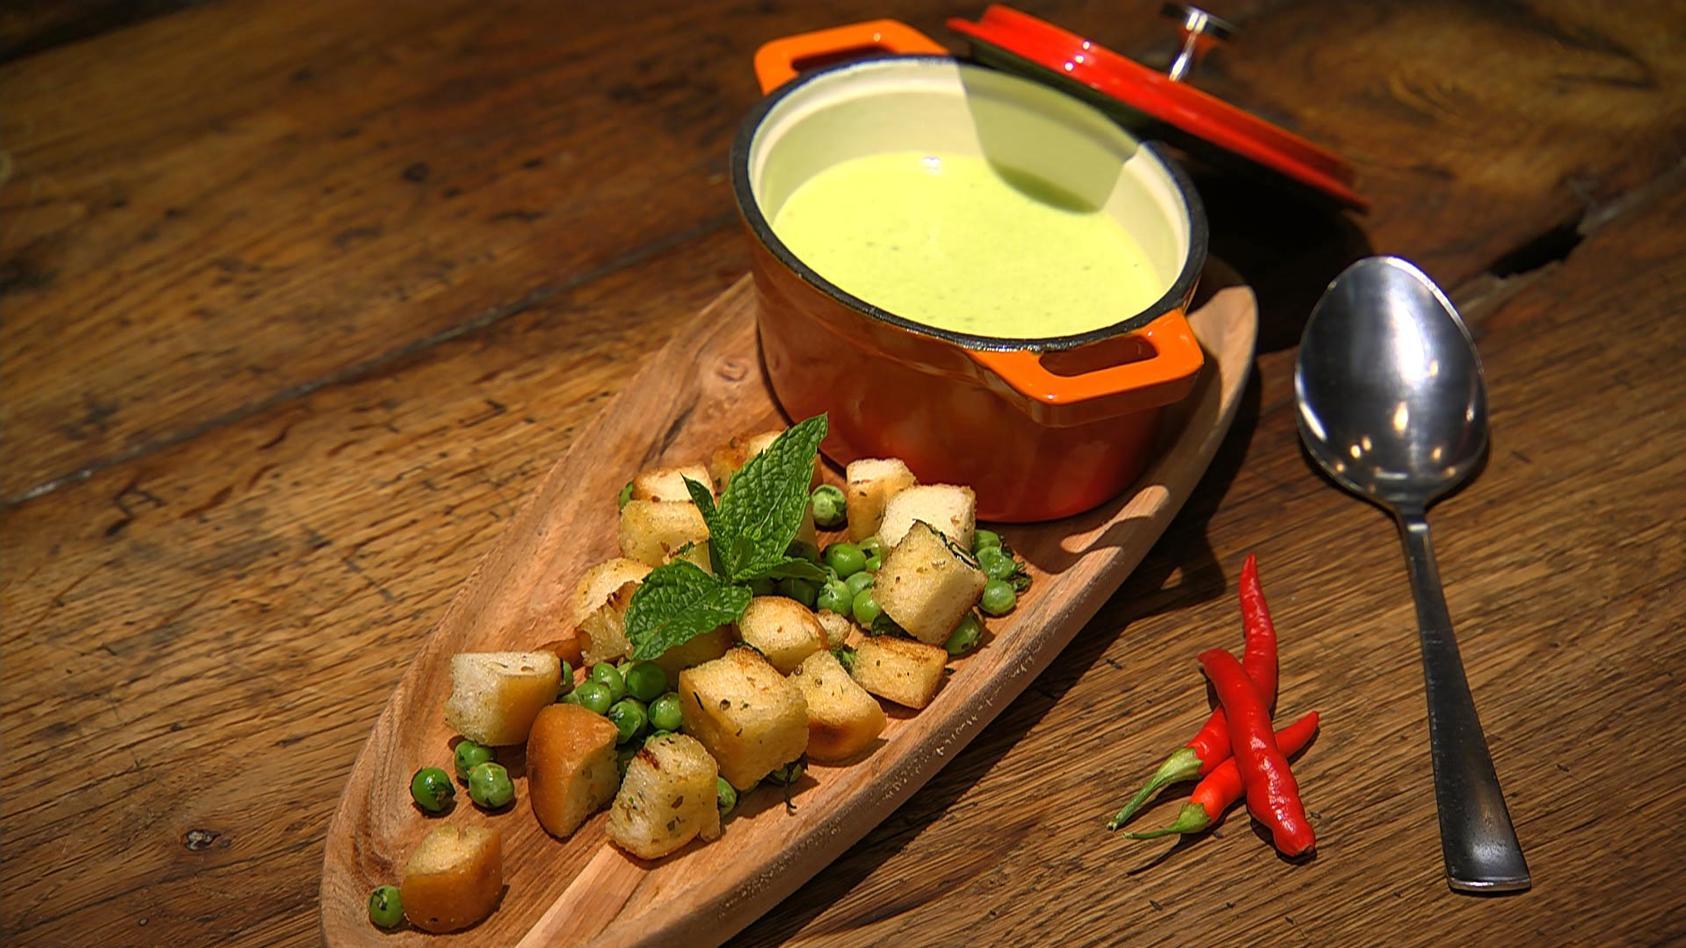 Grüne Kräuterküche: Erbsen-Minz-Suppe